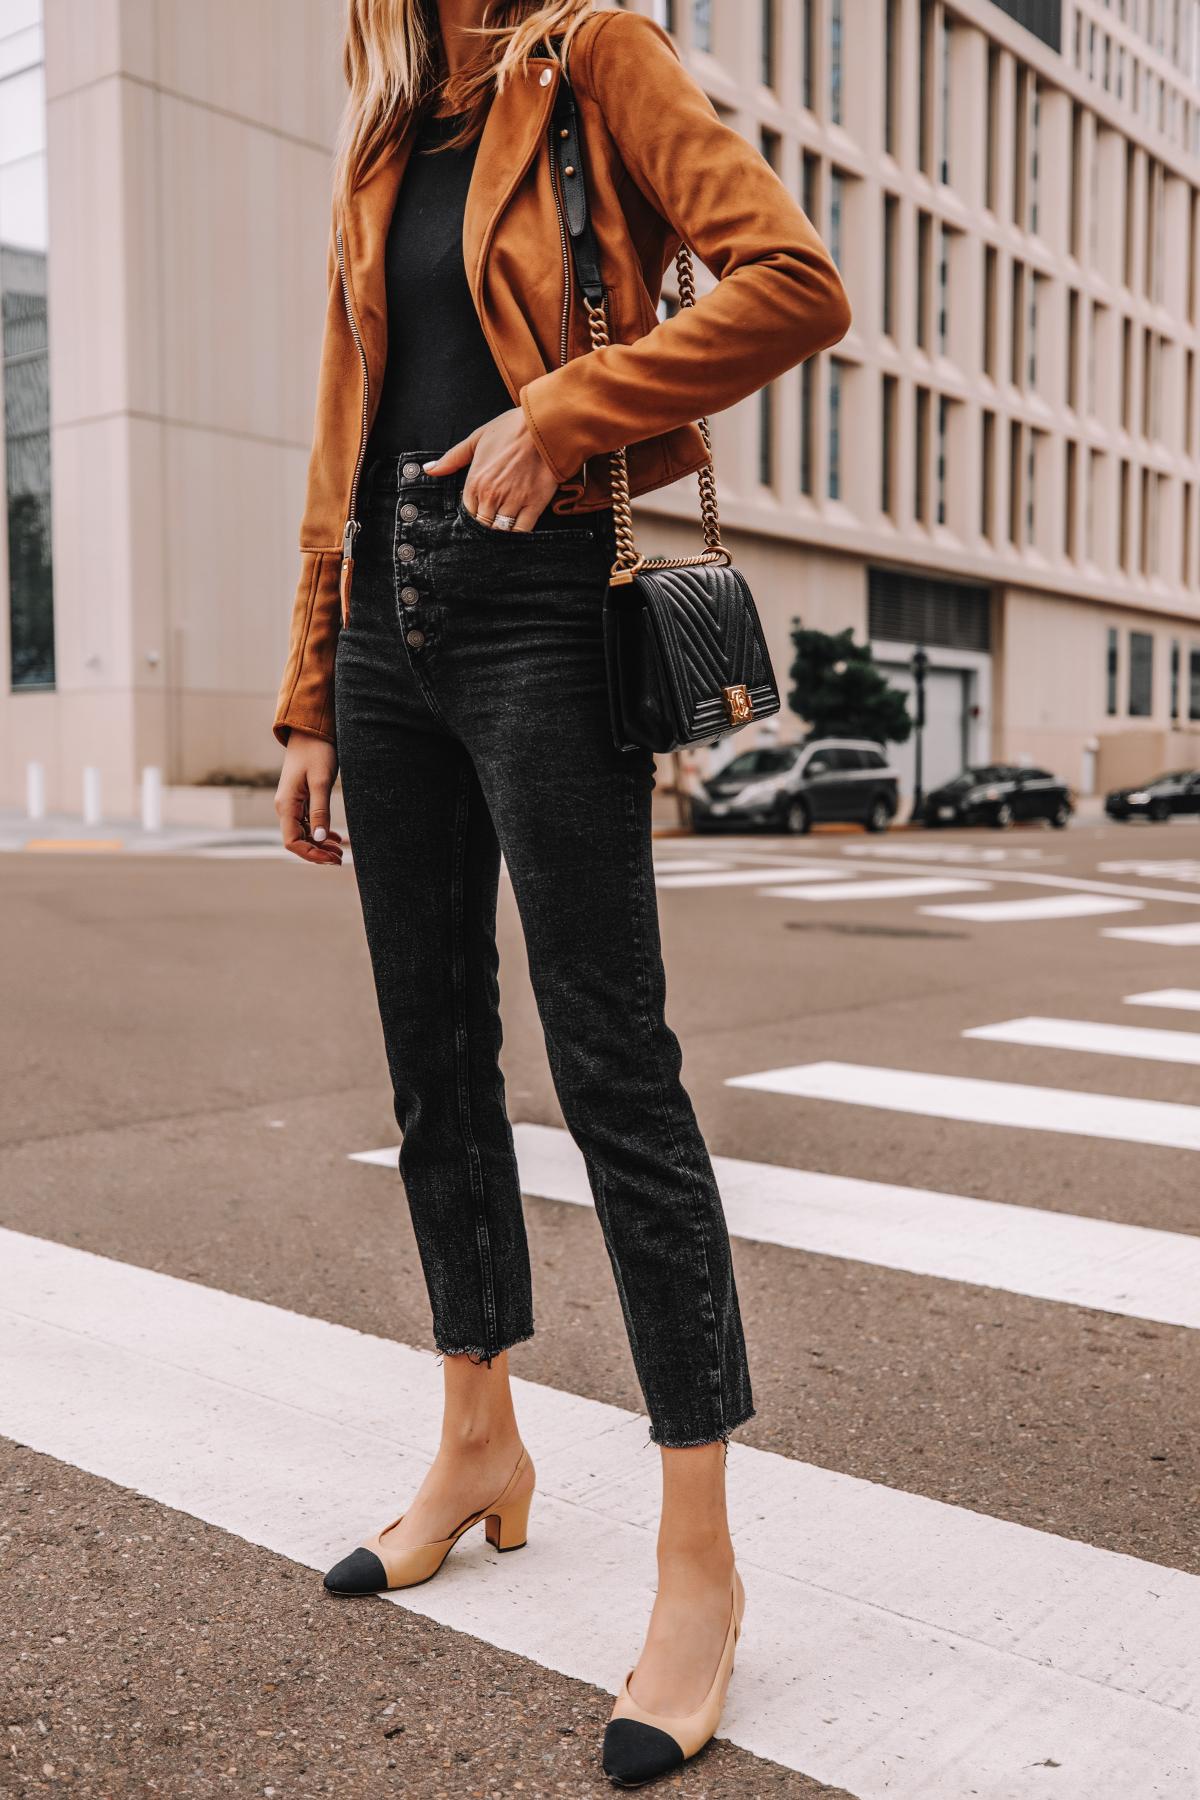 Fashion Jackson Wearing Abercrombie Tan Suede Moto Jacket Black Button Front Jeans Chanel Slingback Shoes